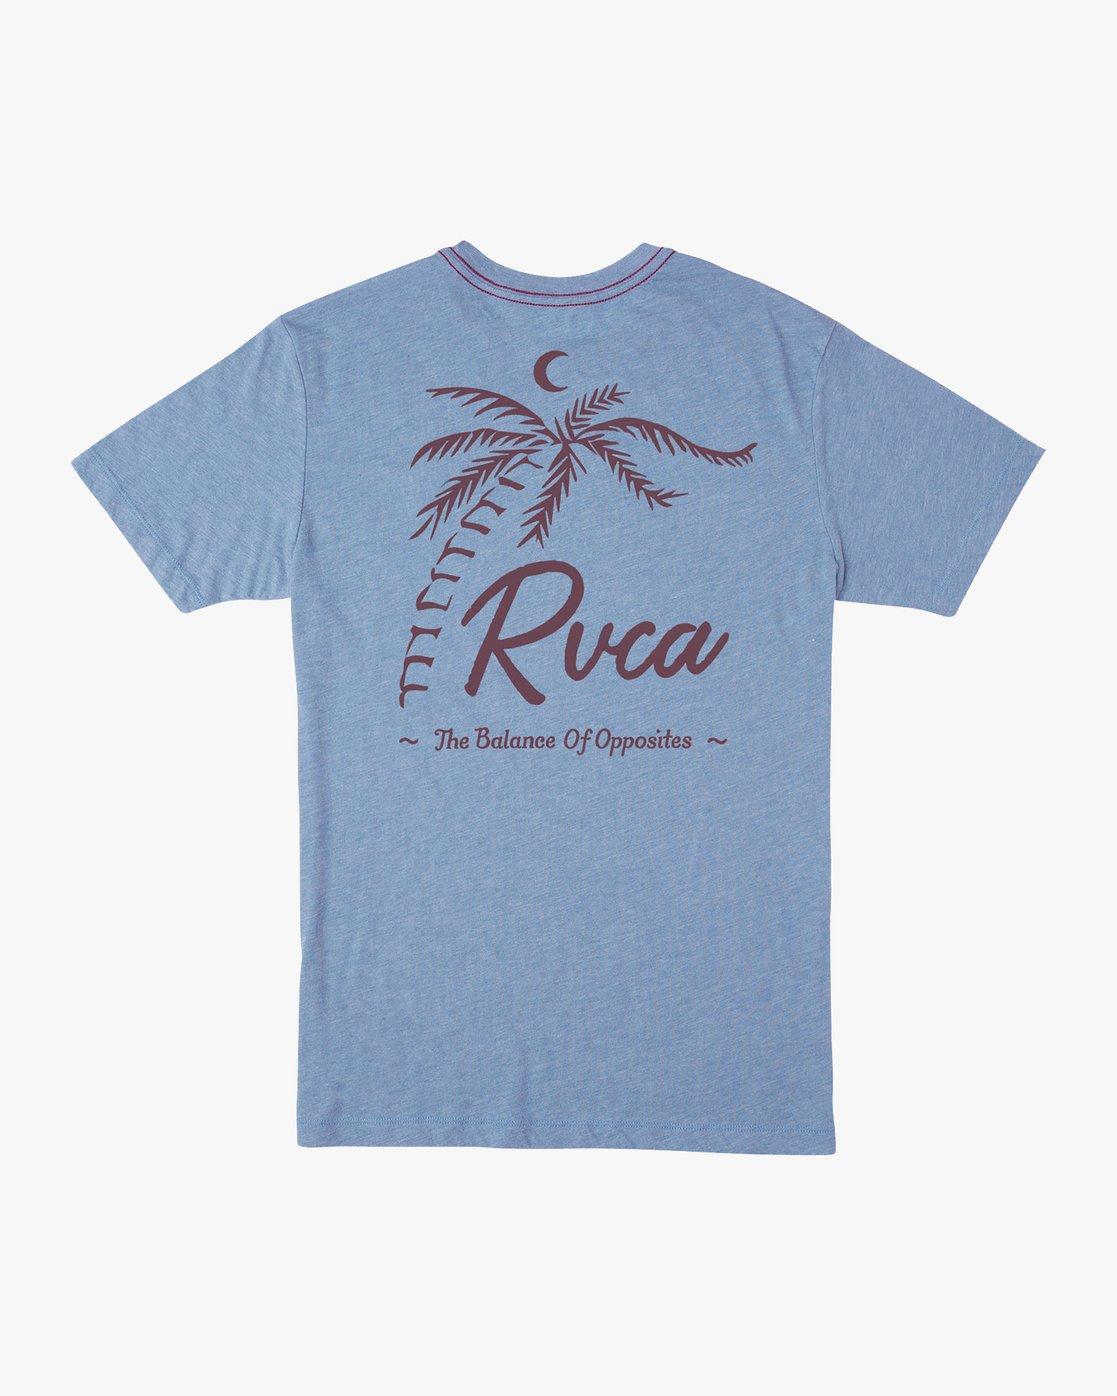 0 Mowgli Tropicale T-Shirt Blue M430URTR RVCA